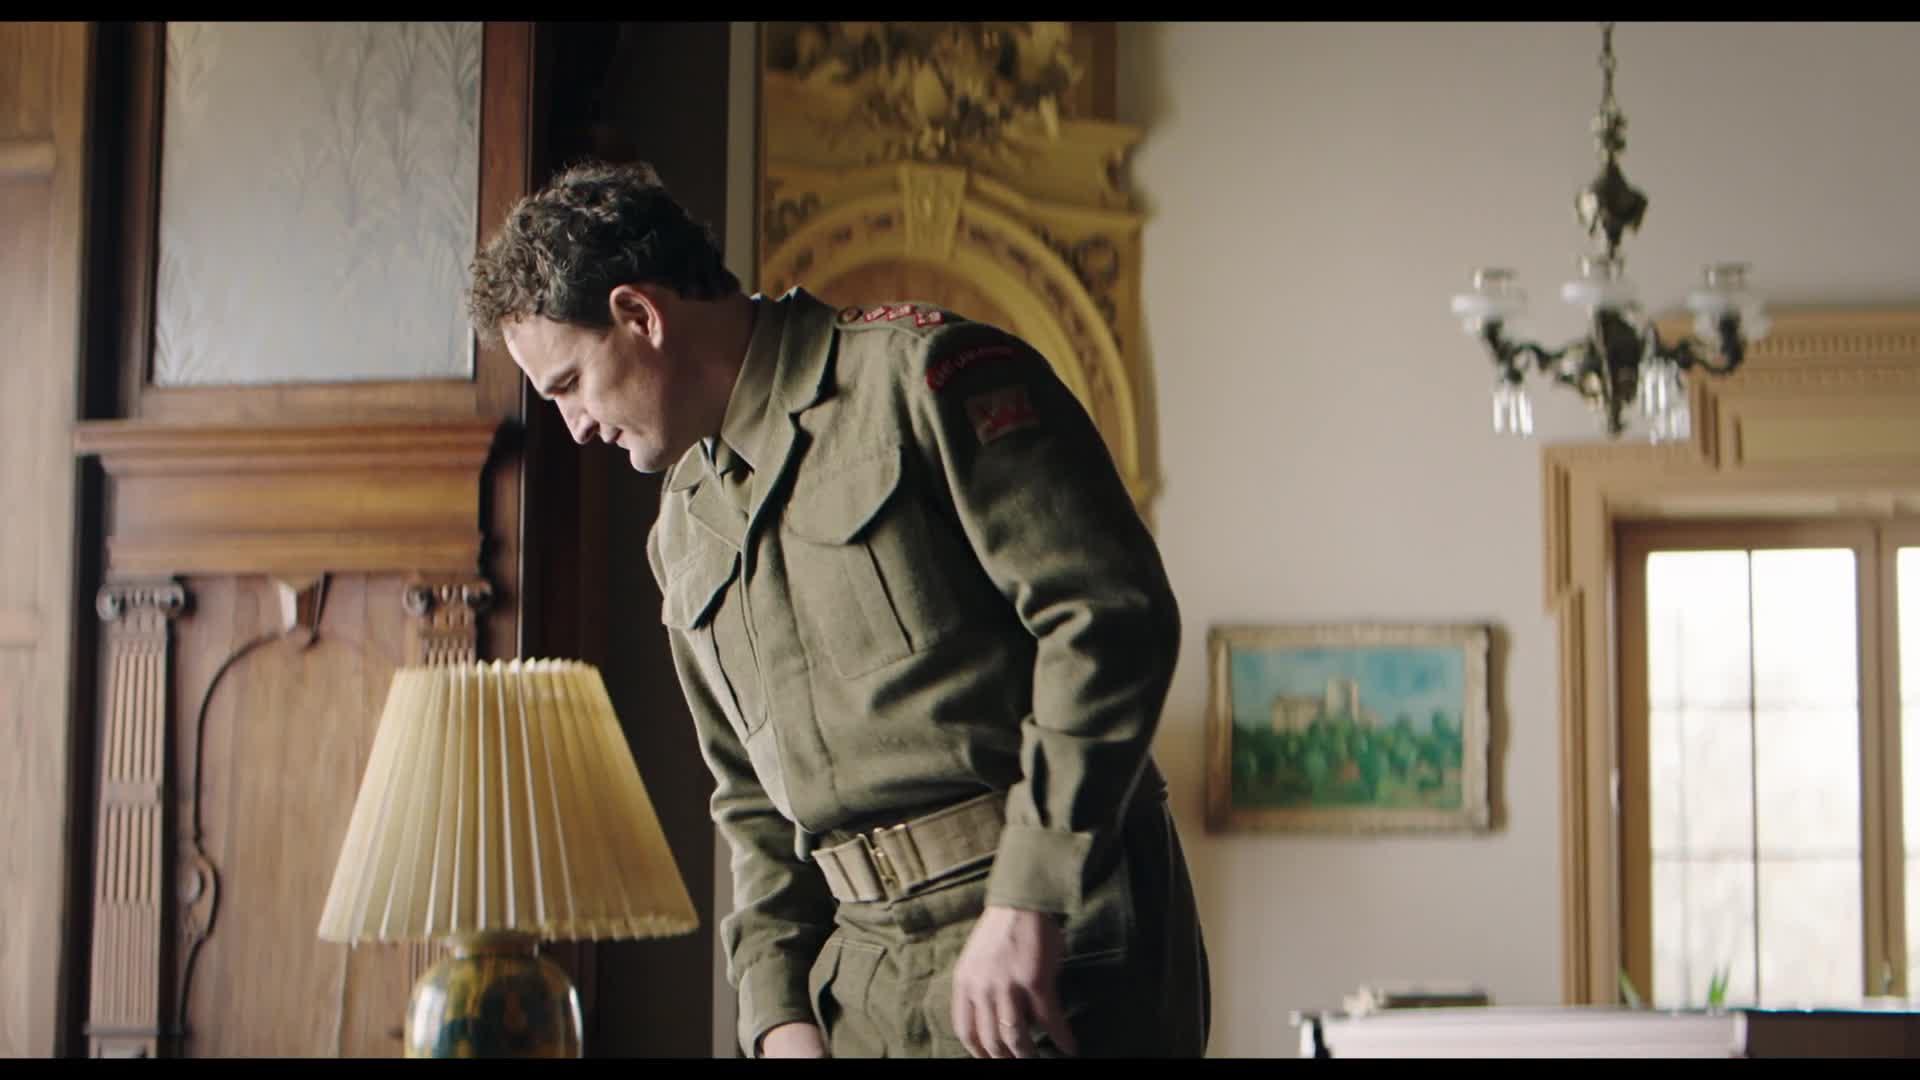 'The Aftermath': Watch Alexander Skarsgard, Jason Clarke spar in deleted scene (Exclusive)